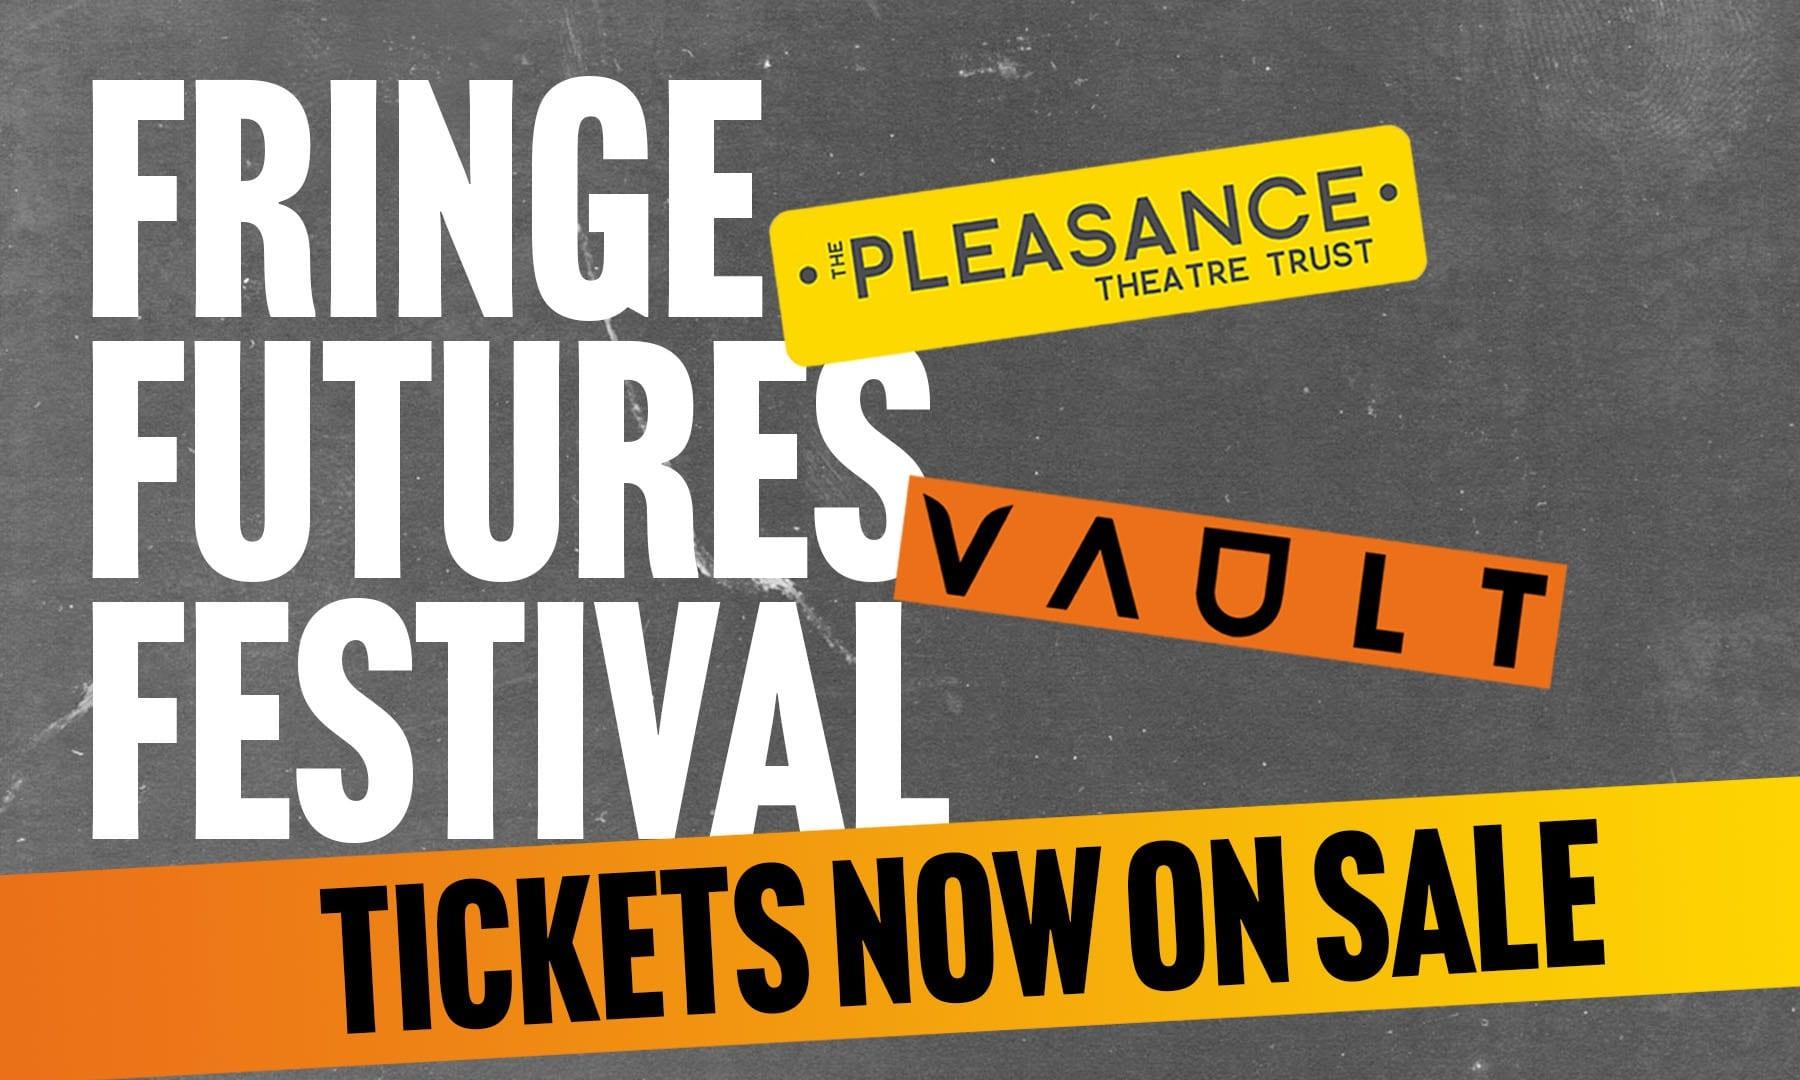 Fringe Futures Festival